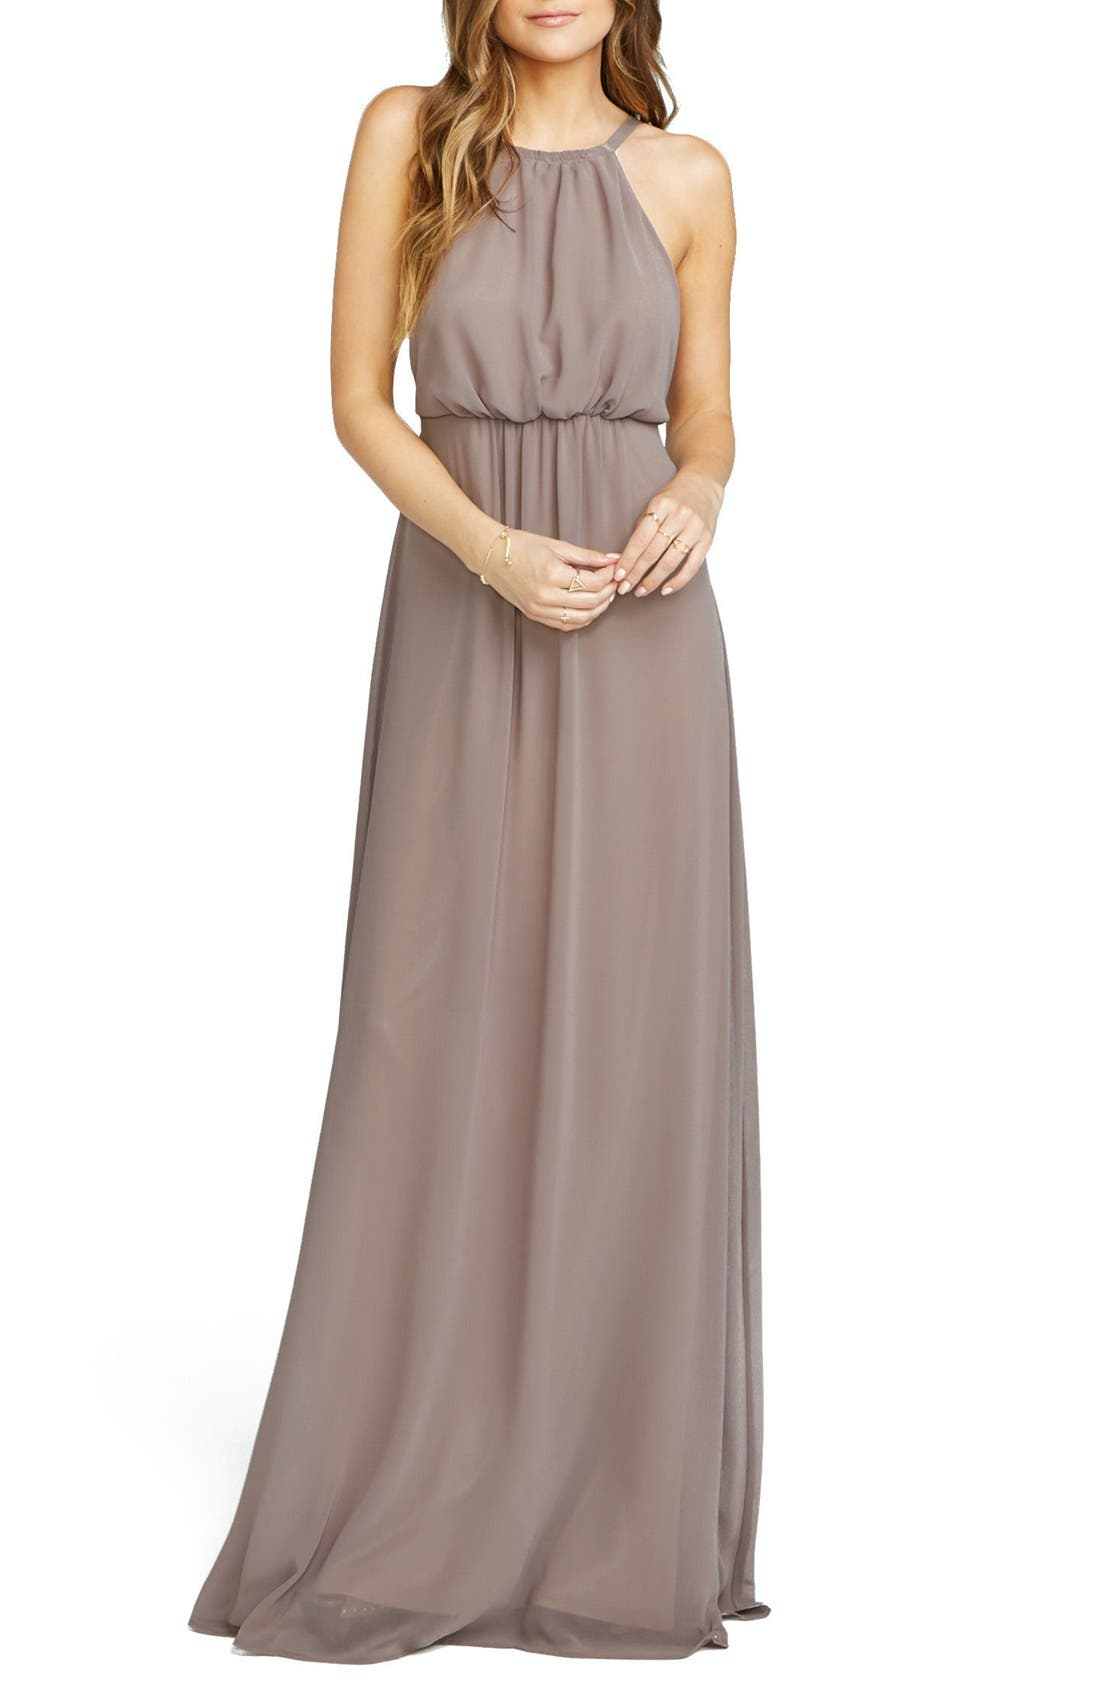 Main Image - Show Me Your Mumu Amanda Open Back Blouson Gown